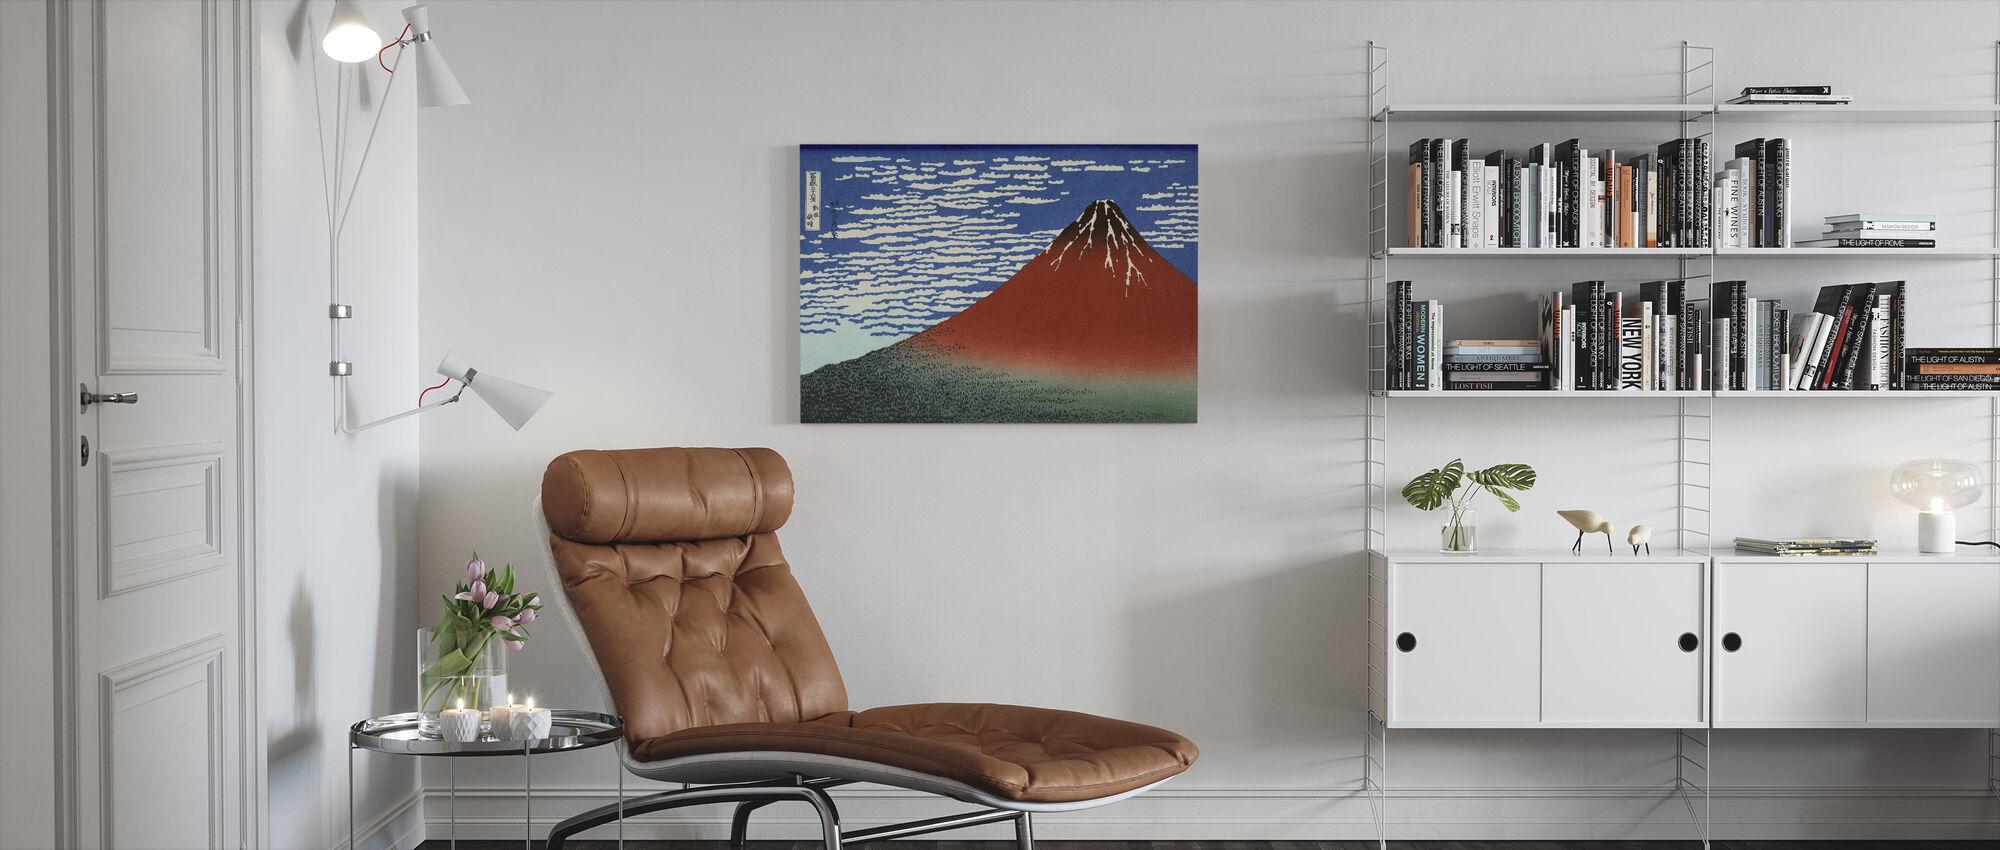 Red Fuji, Katsushika Hokusai - Canvastaulu - Olohuone